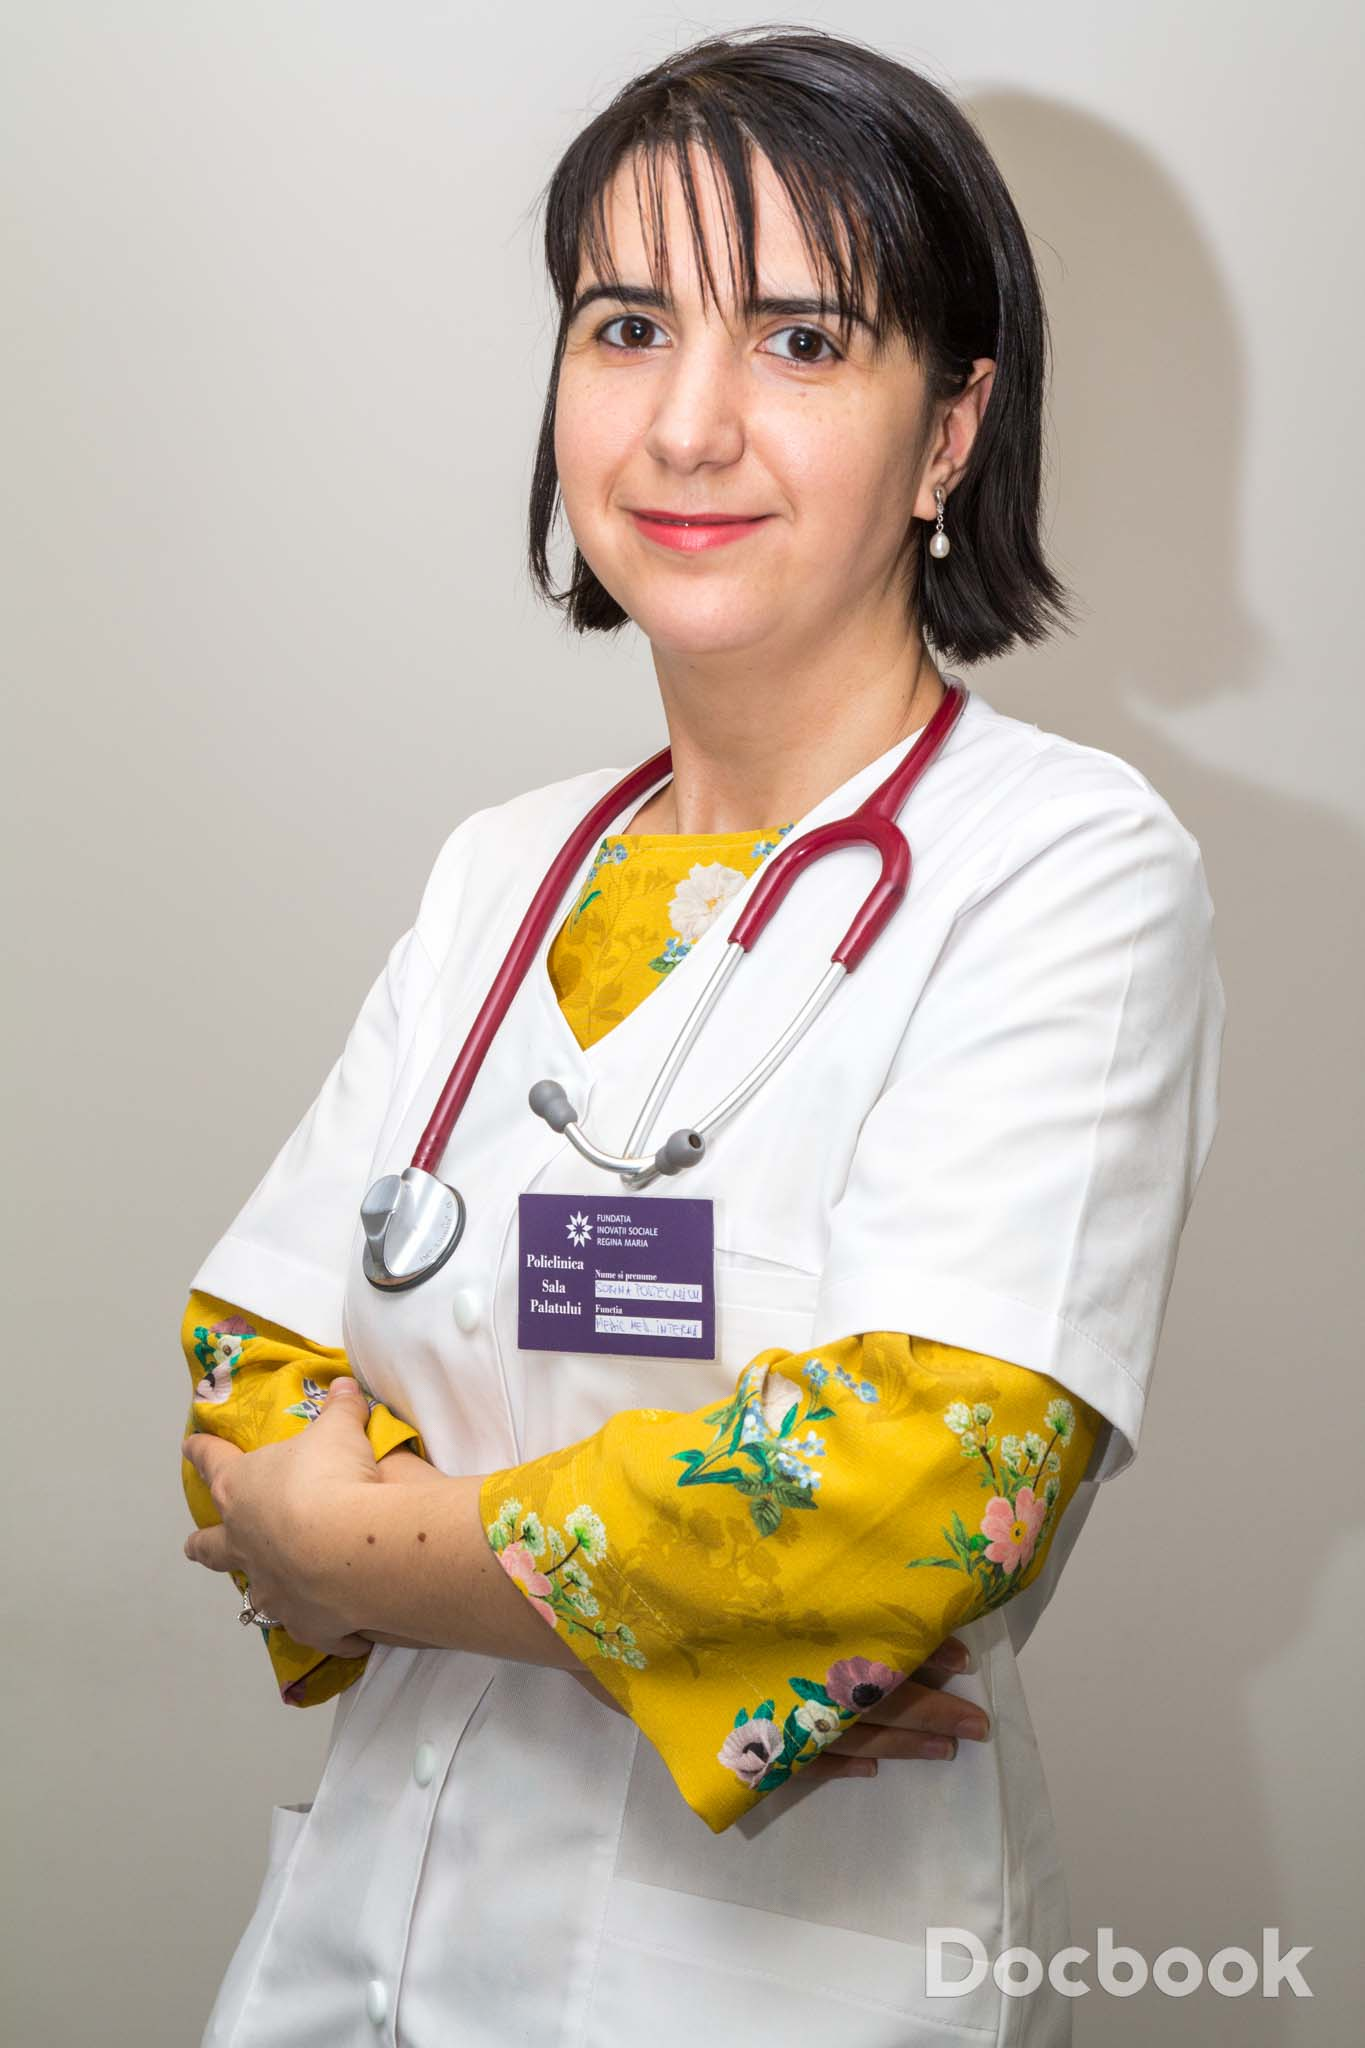 Dr. Sorina Postelnicu